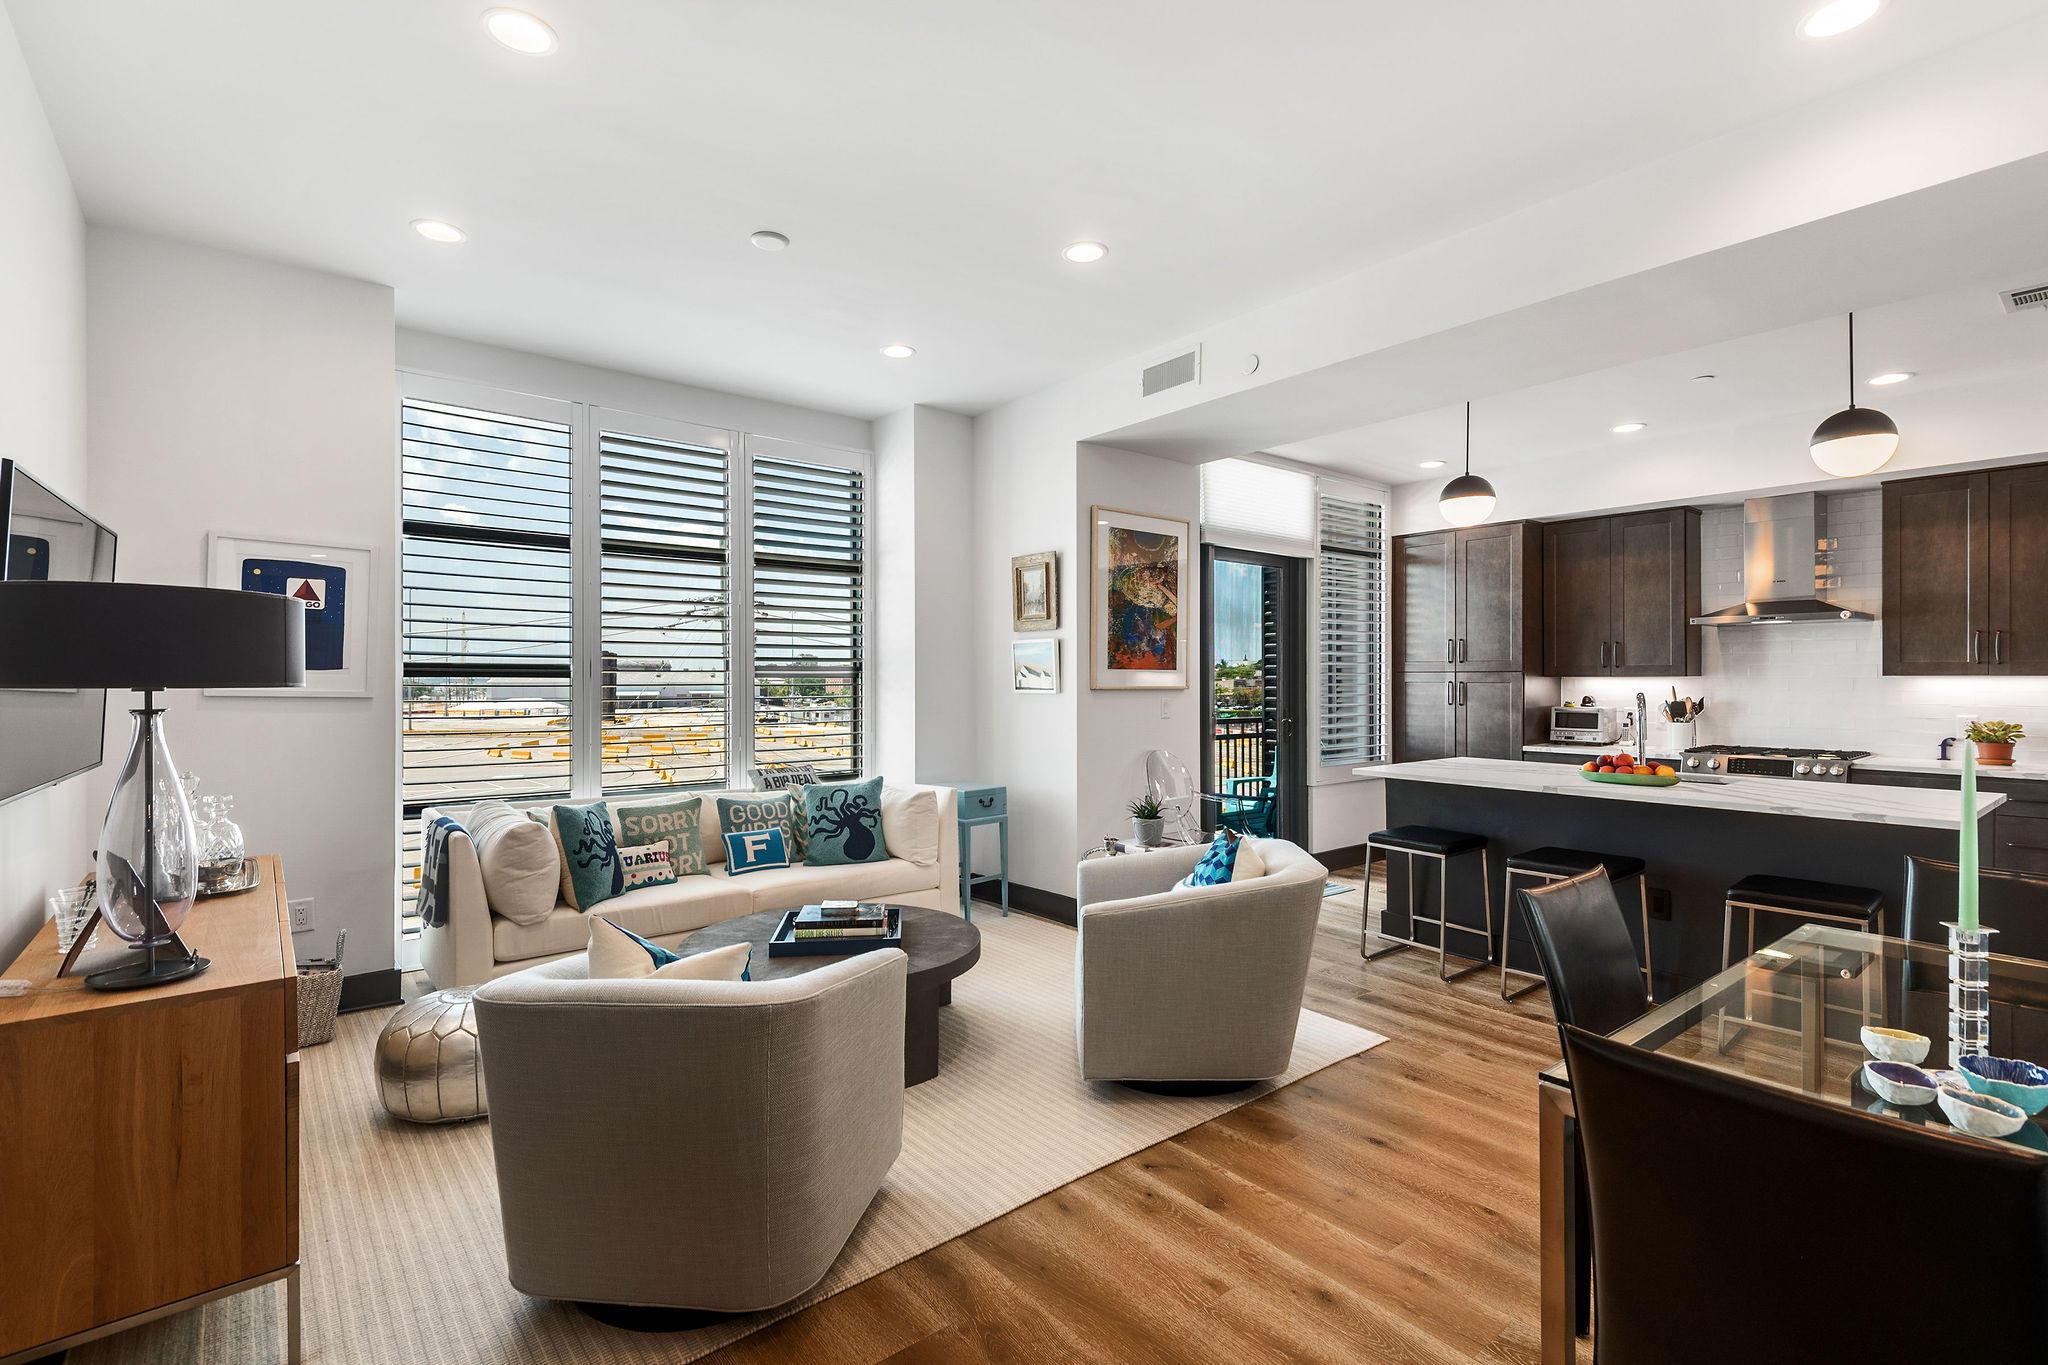 Gadsdenboro Homes For Sale - 5 Gadsdenboro, Charleston, SC - 32